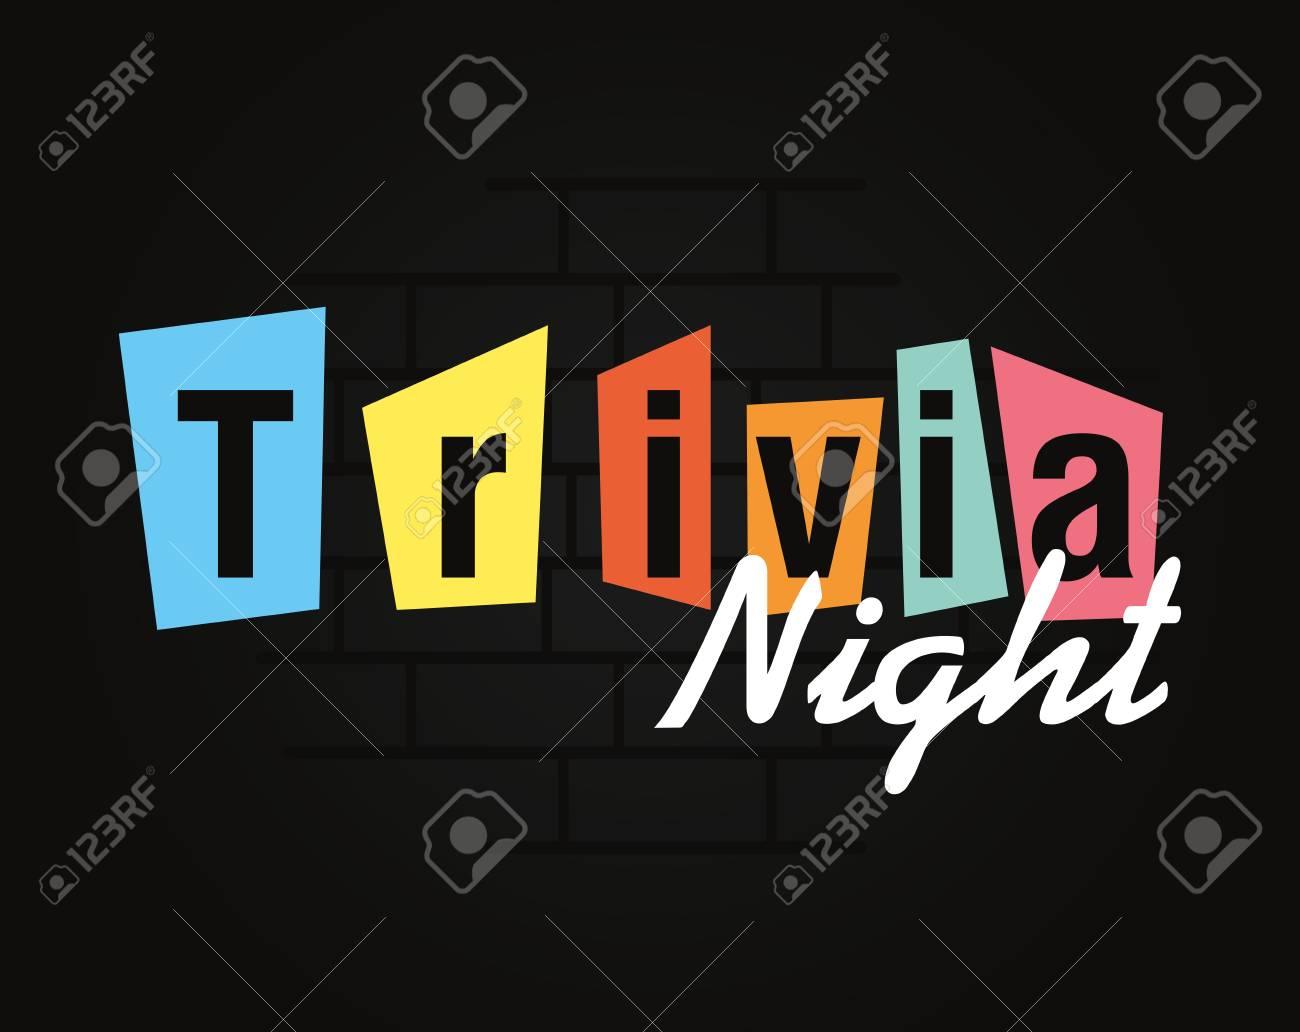 trivia night lettering on dark background vector illustration - 124675404